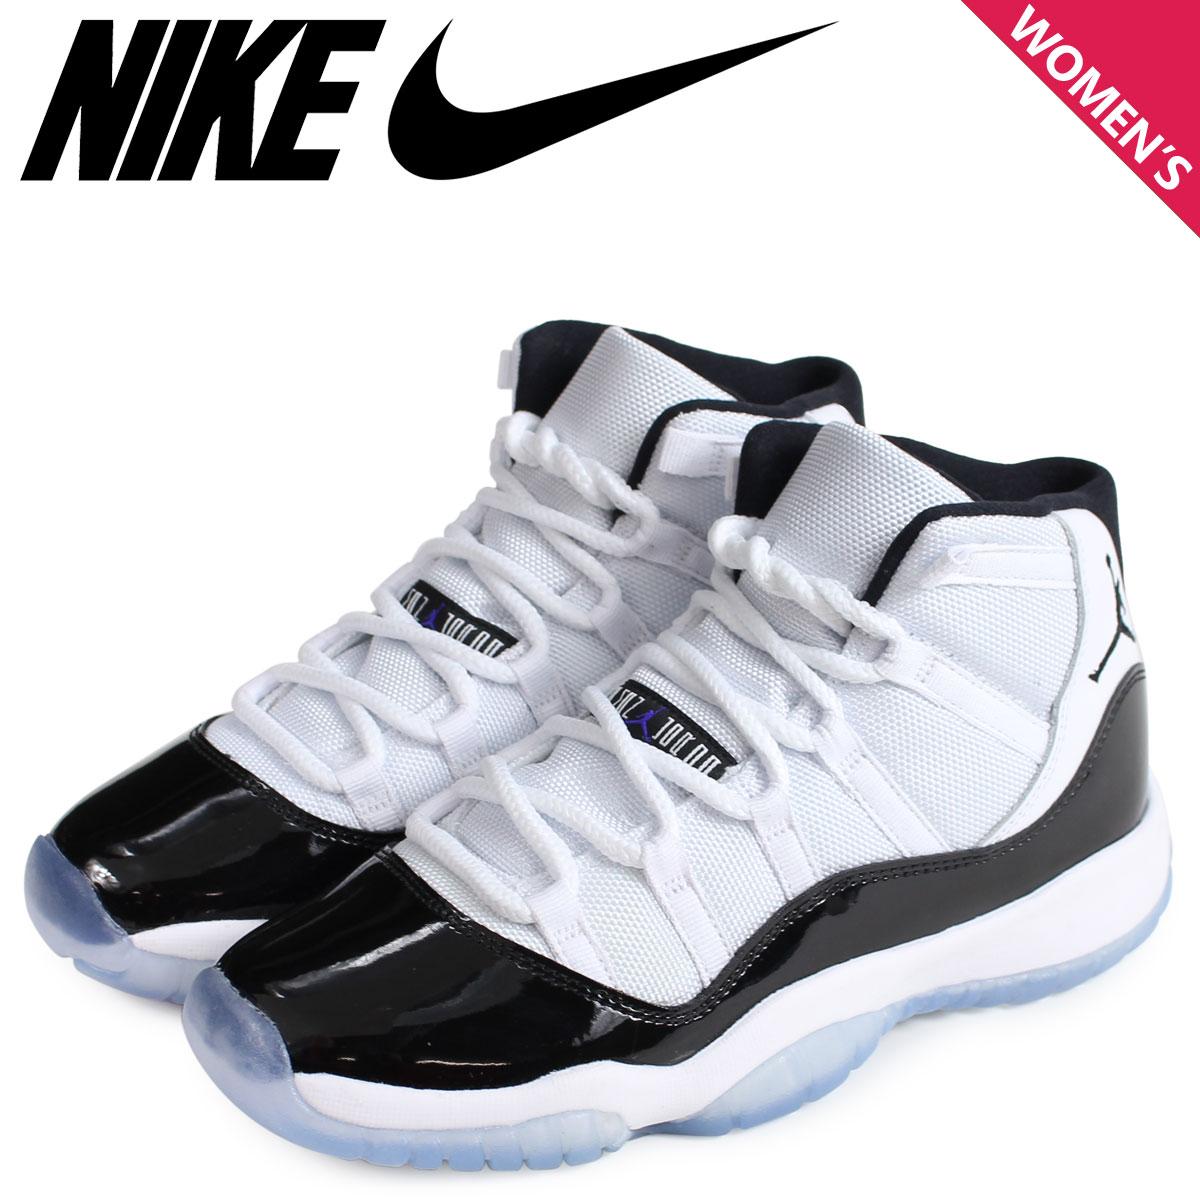 366e3eaa22 NIKE Nike Air Jordan 11 nostalgic sneakers Lady's AIR JORDAN 11 RETRO GS  378,038-100 white white